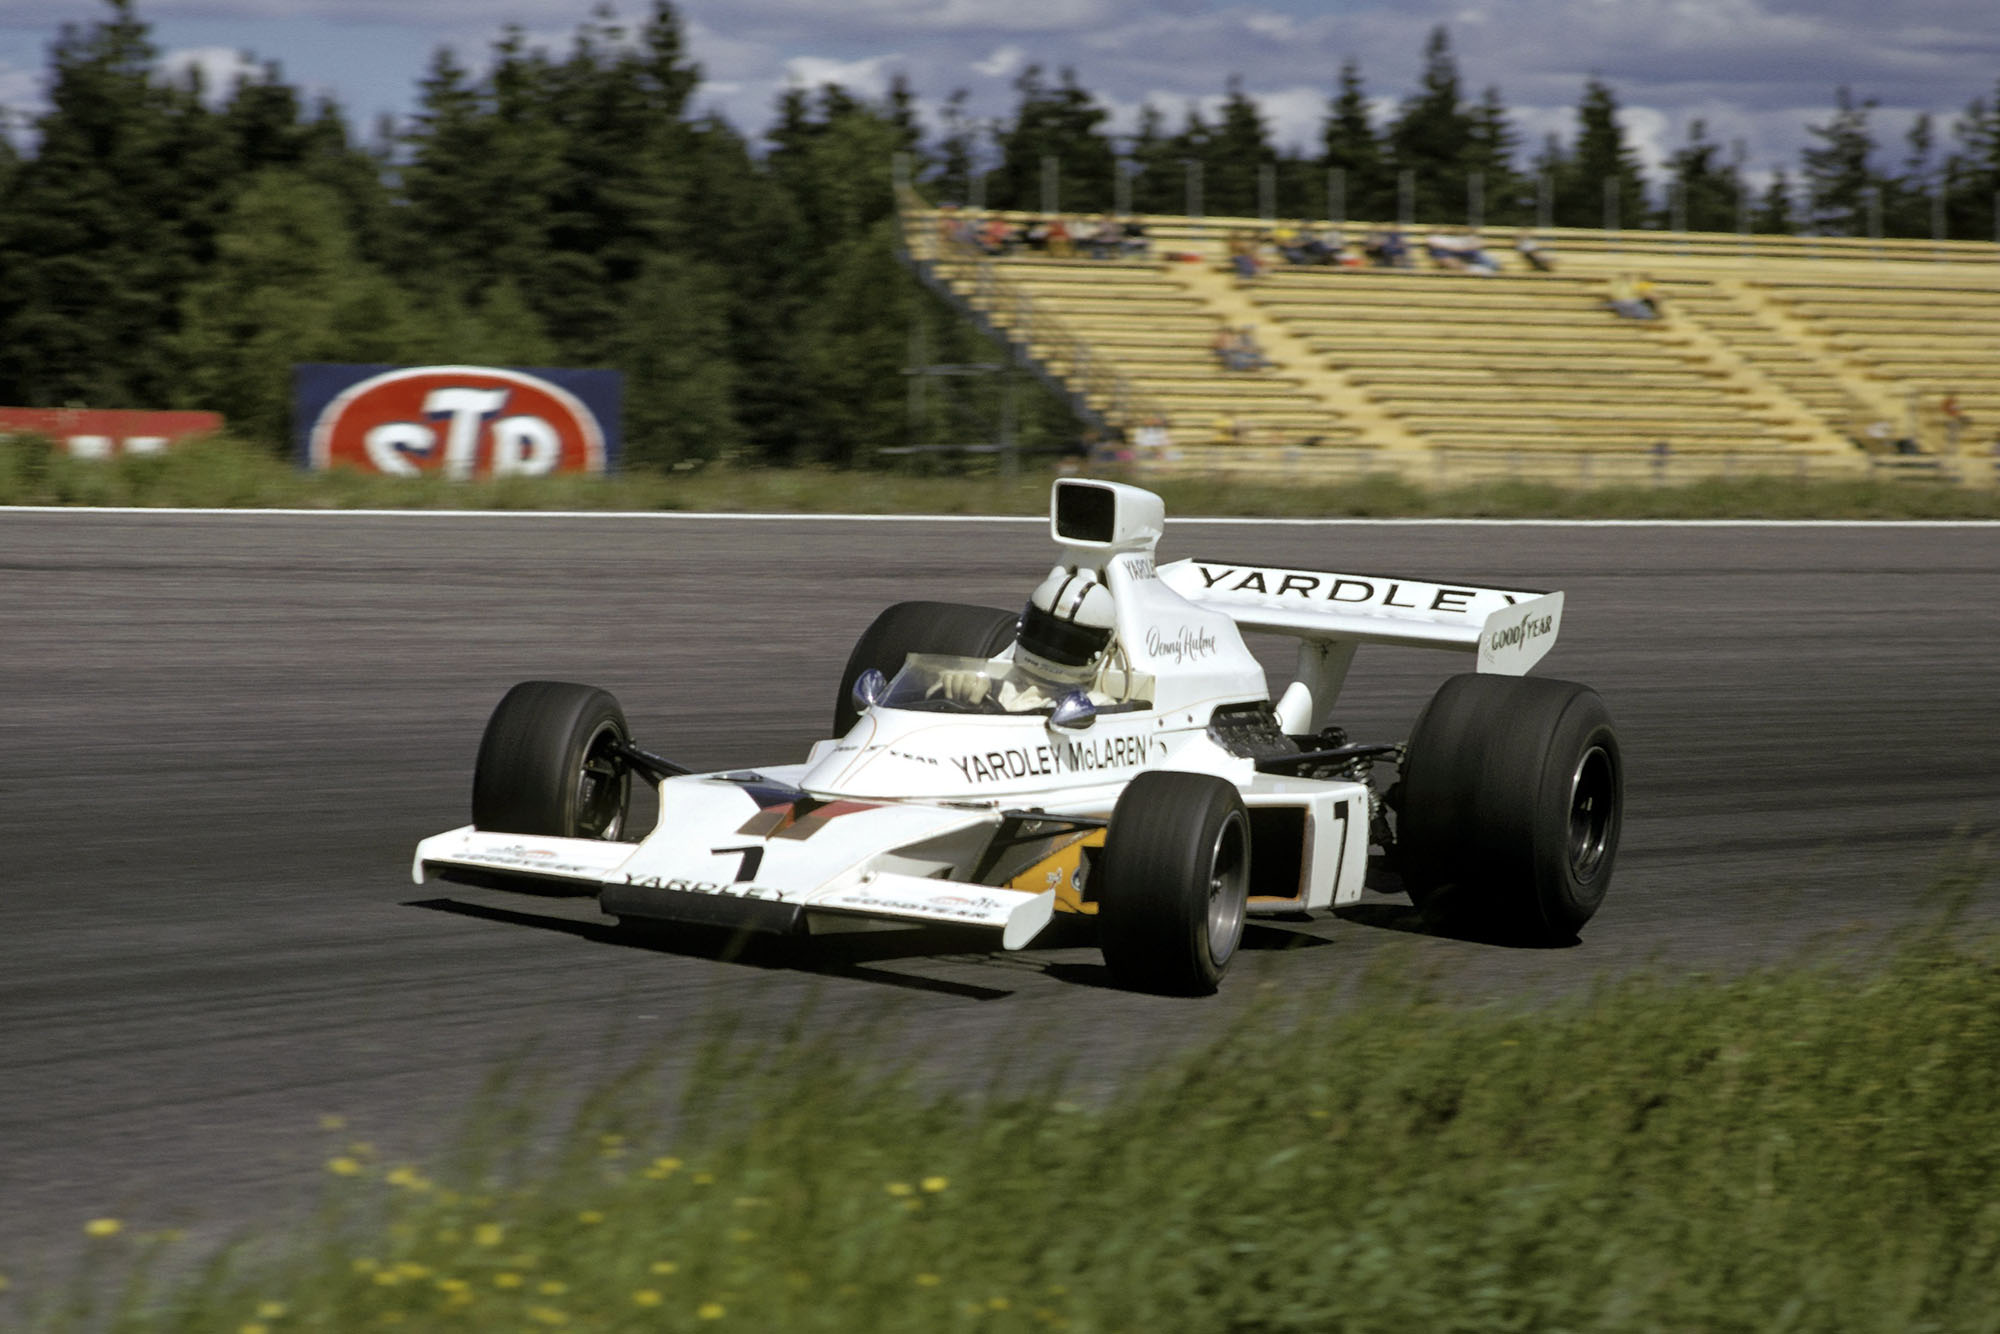 Denny Hulme driving for McLaren at the 1973 Swedish Grand Prix.